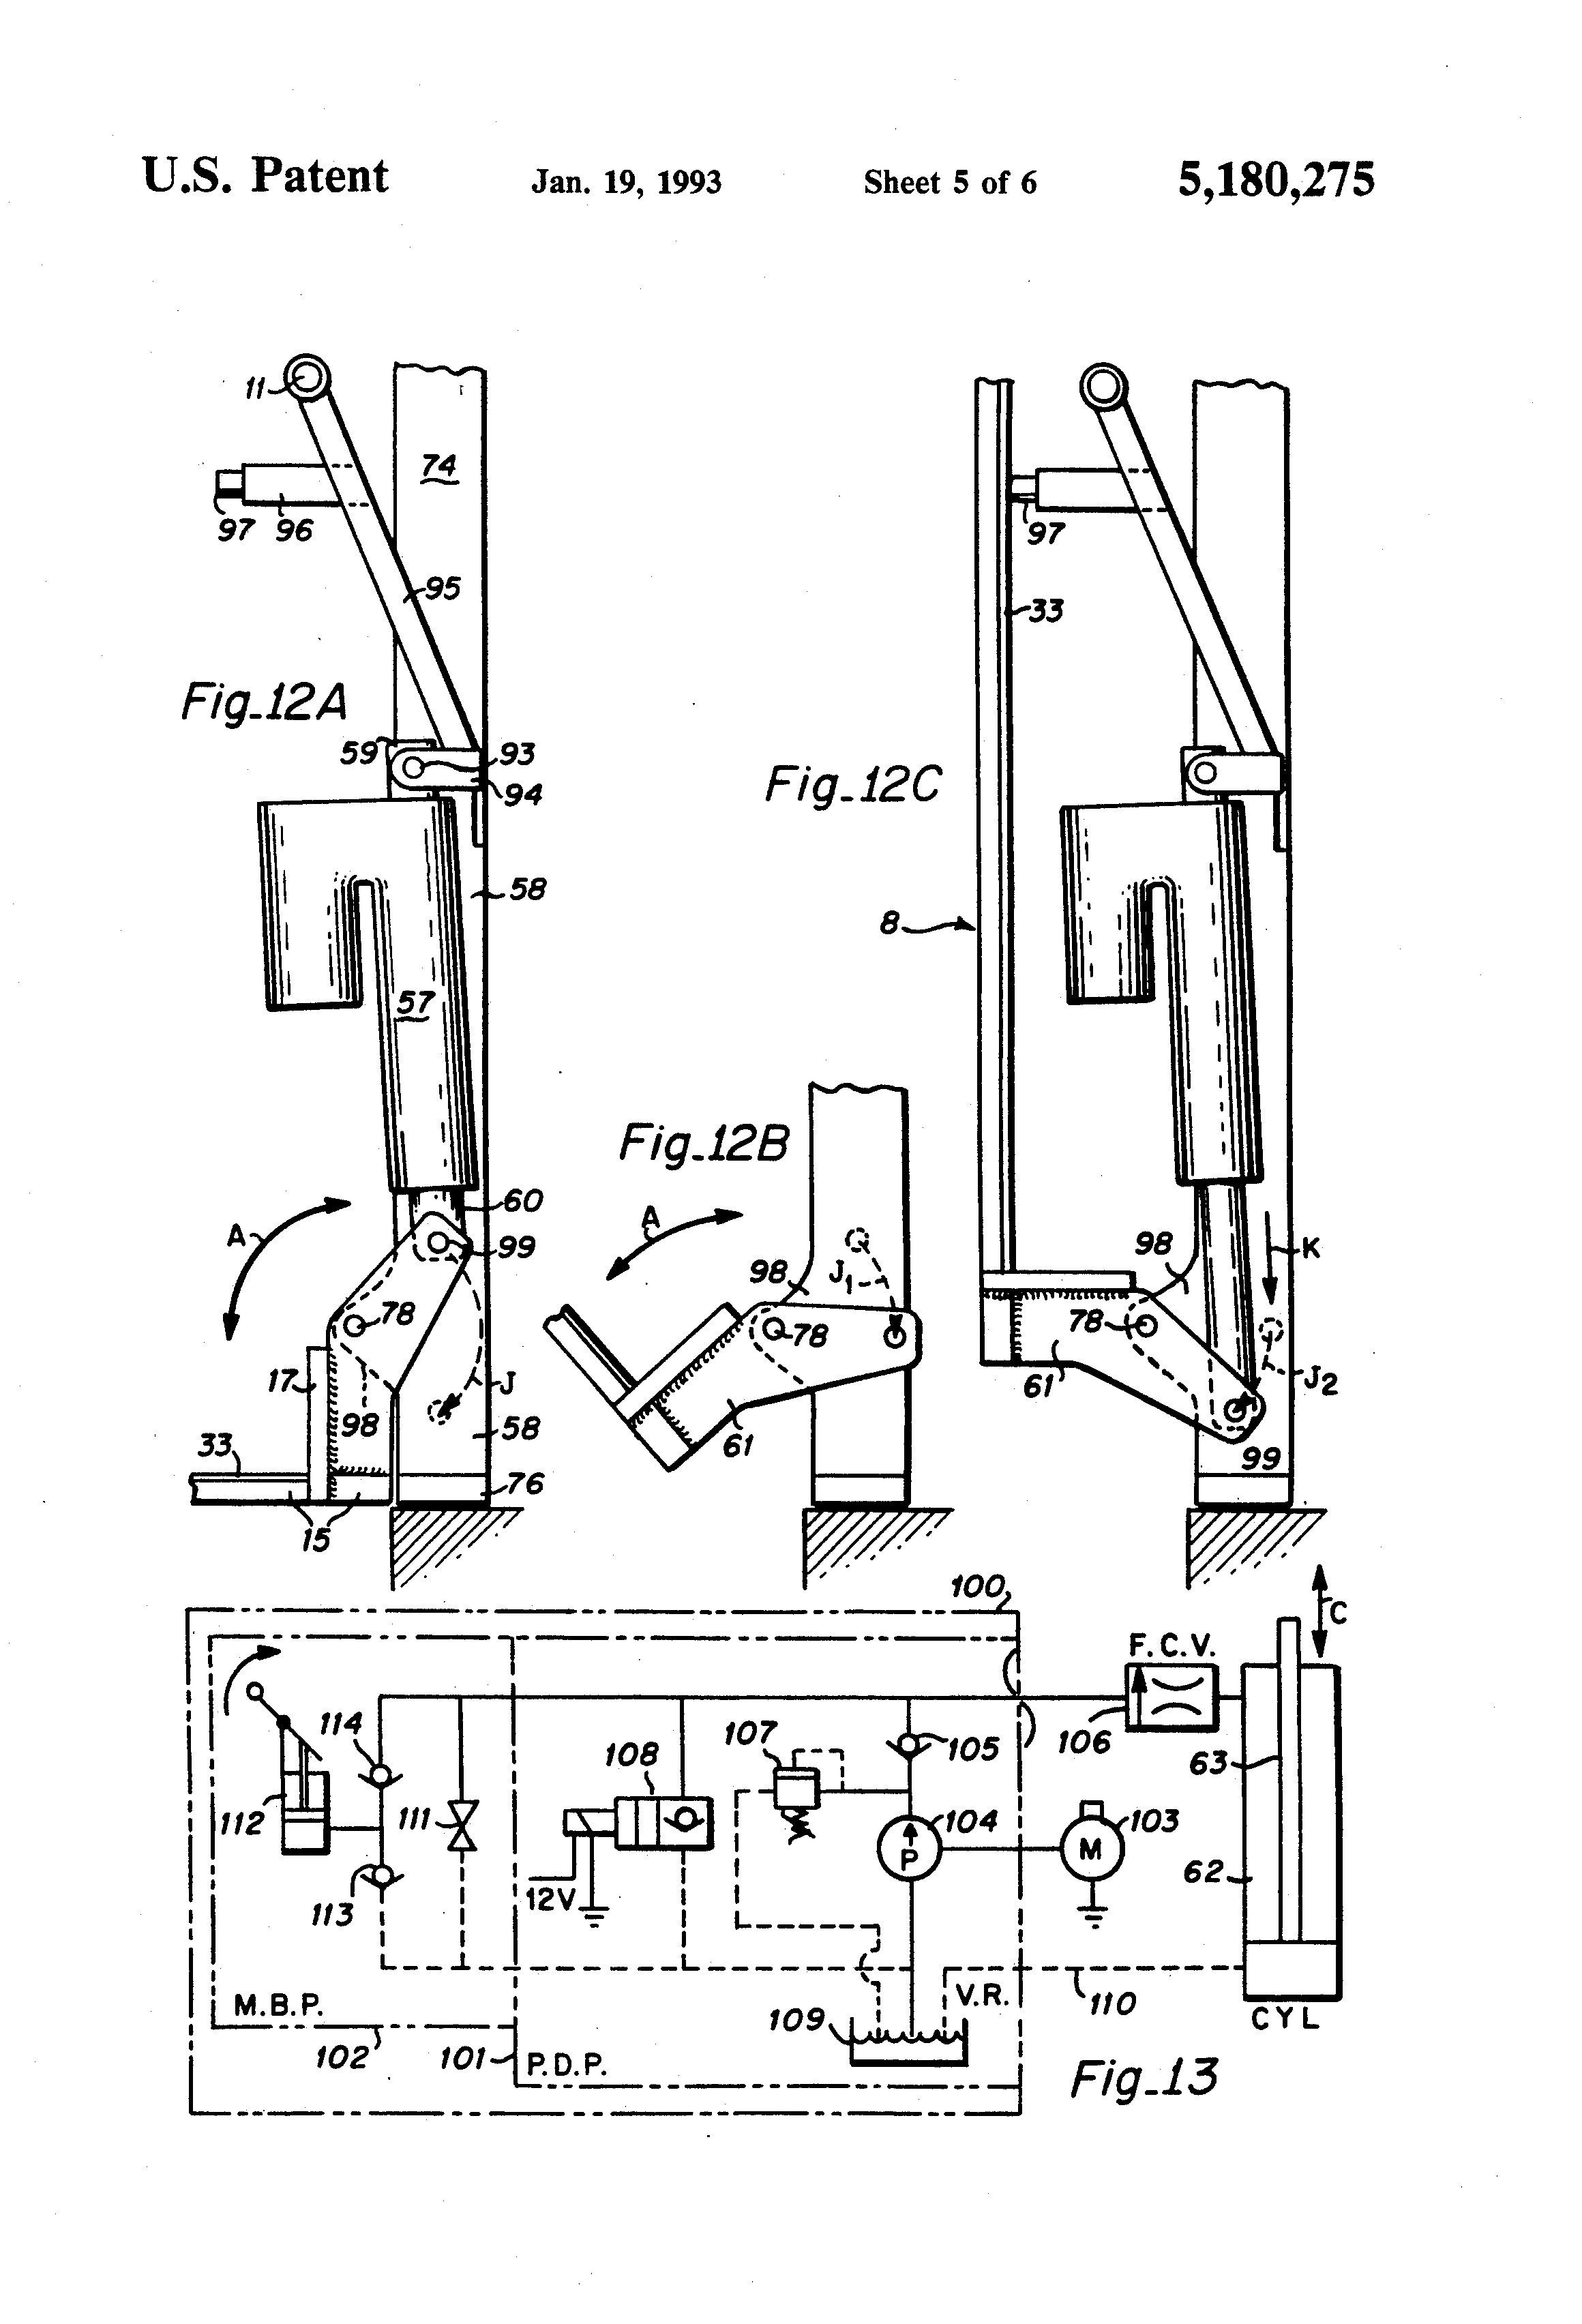 elegant automotive electrical wiring diagram symbols diagrams digramssample diagramimages wiringdiagramsample wiringdiagram [ 2320 x 3408 Pixel ]